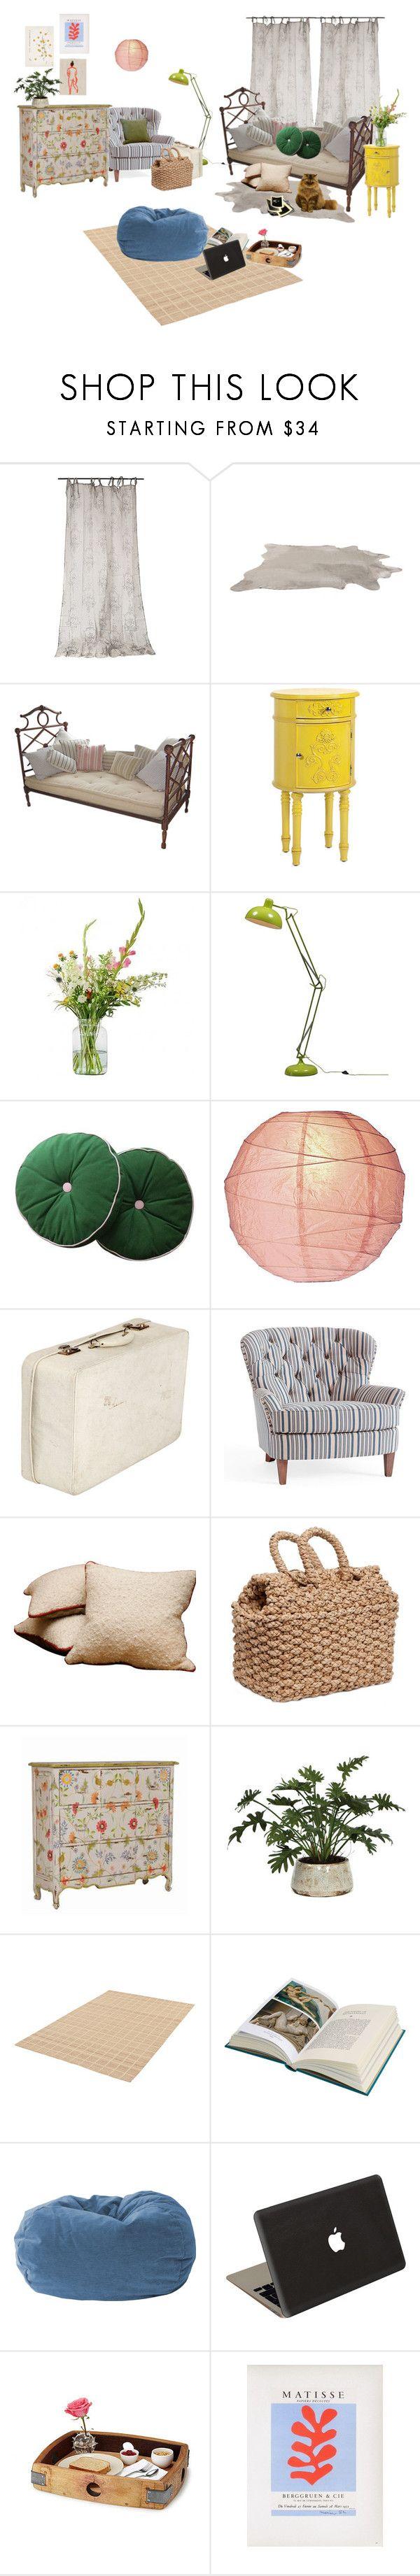 best 25 dot and bo ideas on pinterest mint kitchen mint decor